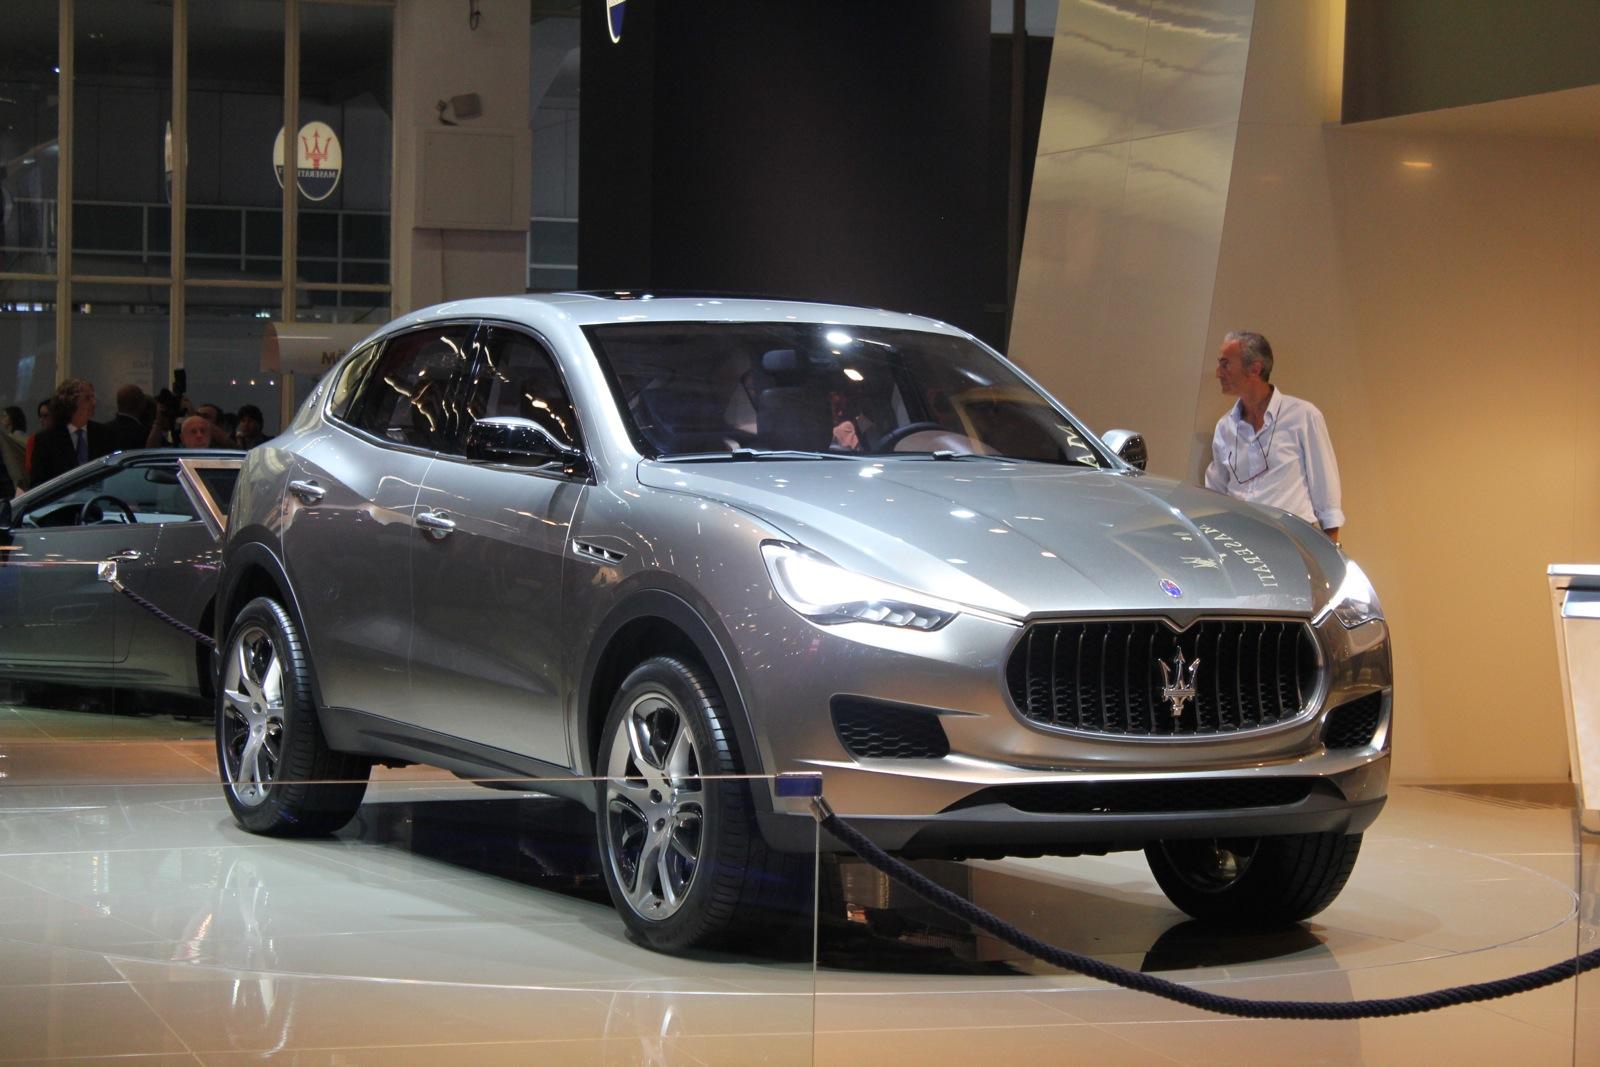 Maserati Levante To Debut At 2016 Detroit Auto Show: Report